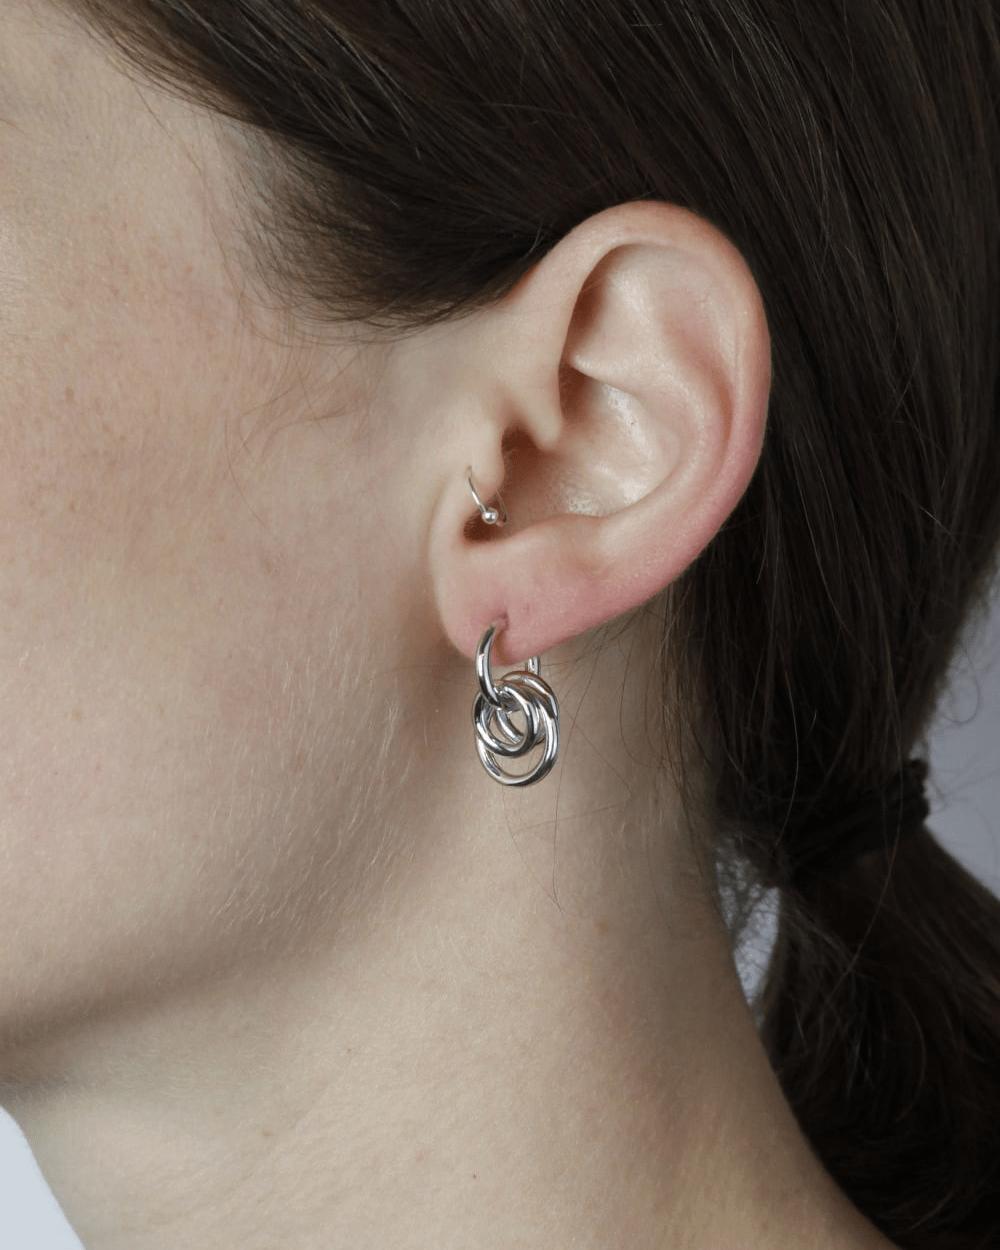 Earrings SILVER TAU SINGLE EARRING NOVE25